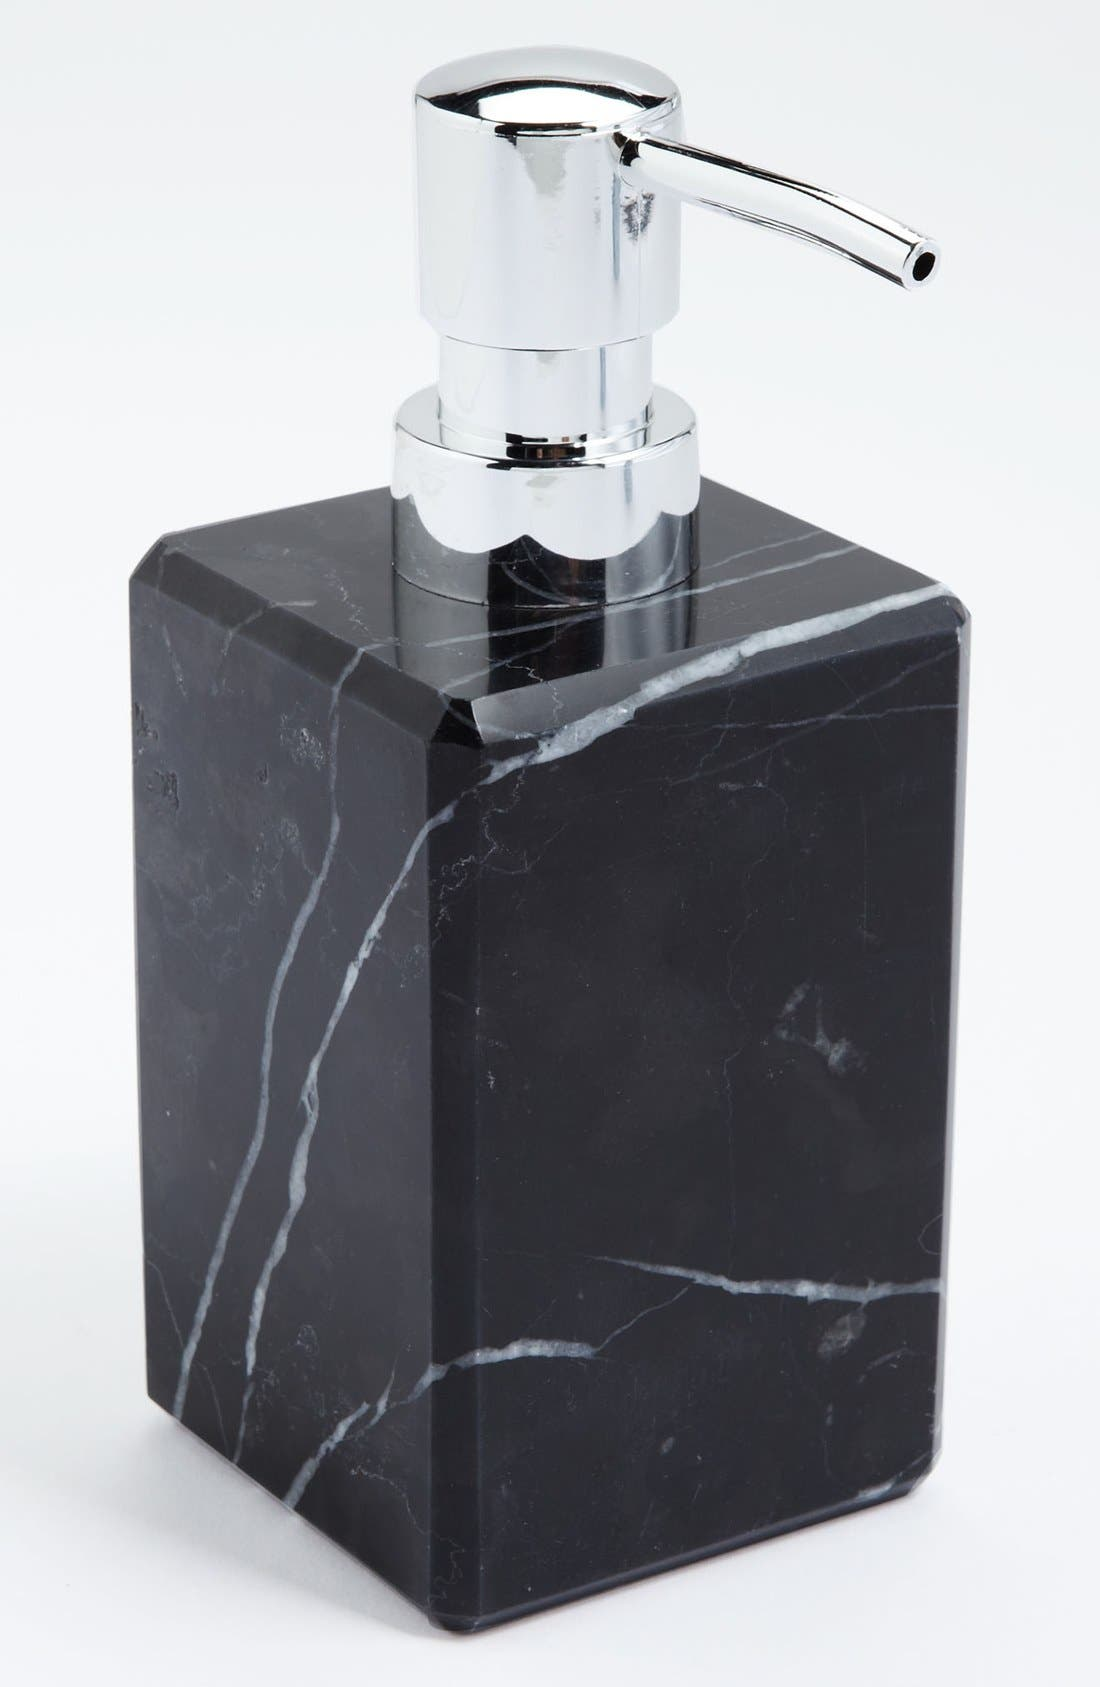 Waterworks Studio 'Luna' Black Marble Soap Dispenser (Online Only)